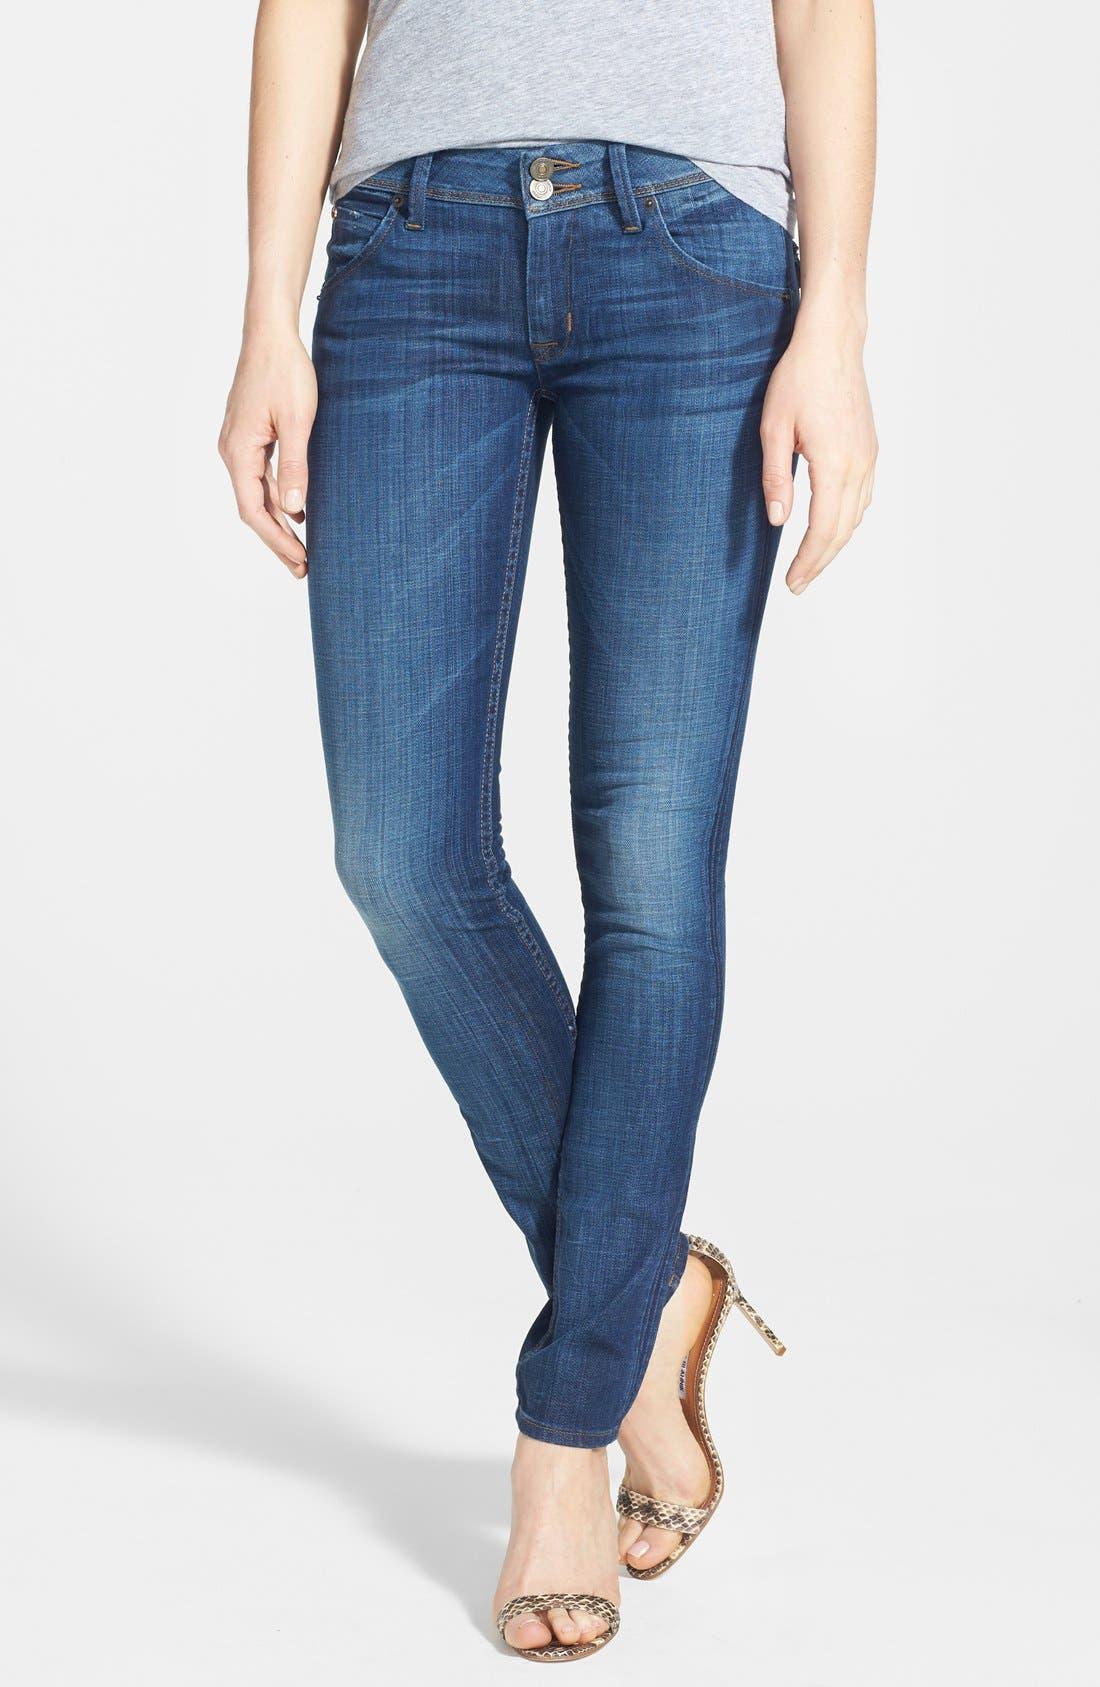 Main Image - Hudson Jeans 'Collin' Skinny Jeans (Saville)